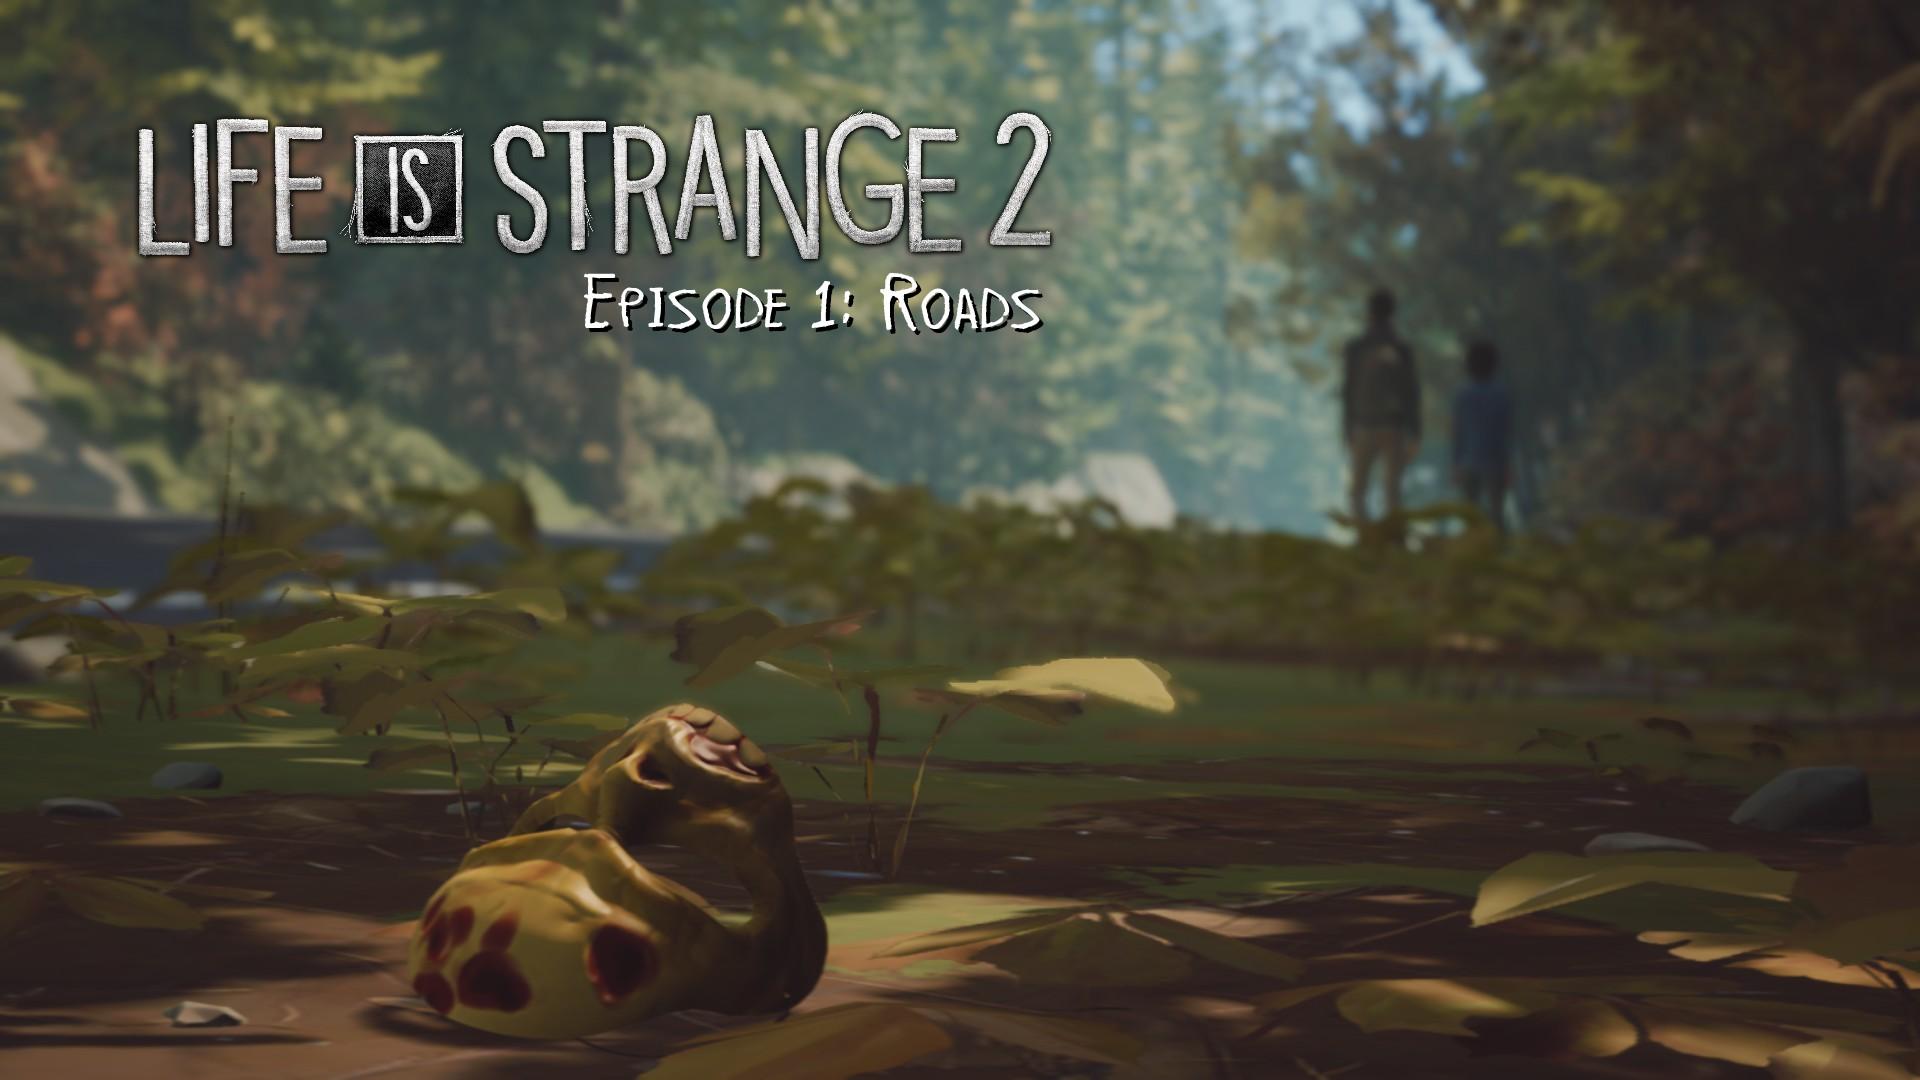 3rd Strike Com Life Is Strange 2 Episode 1 Review